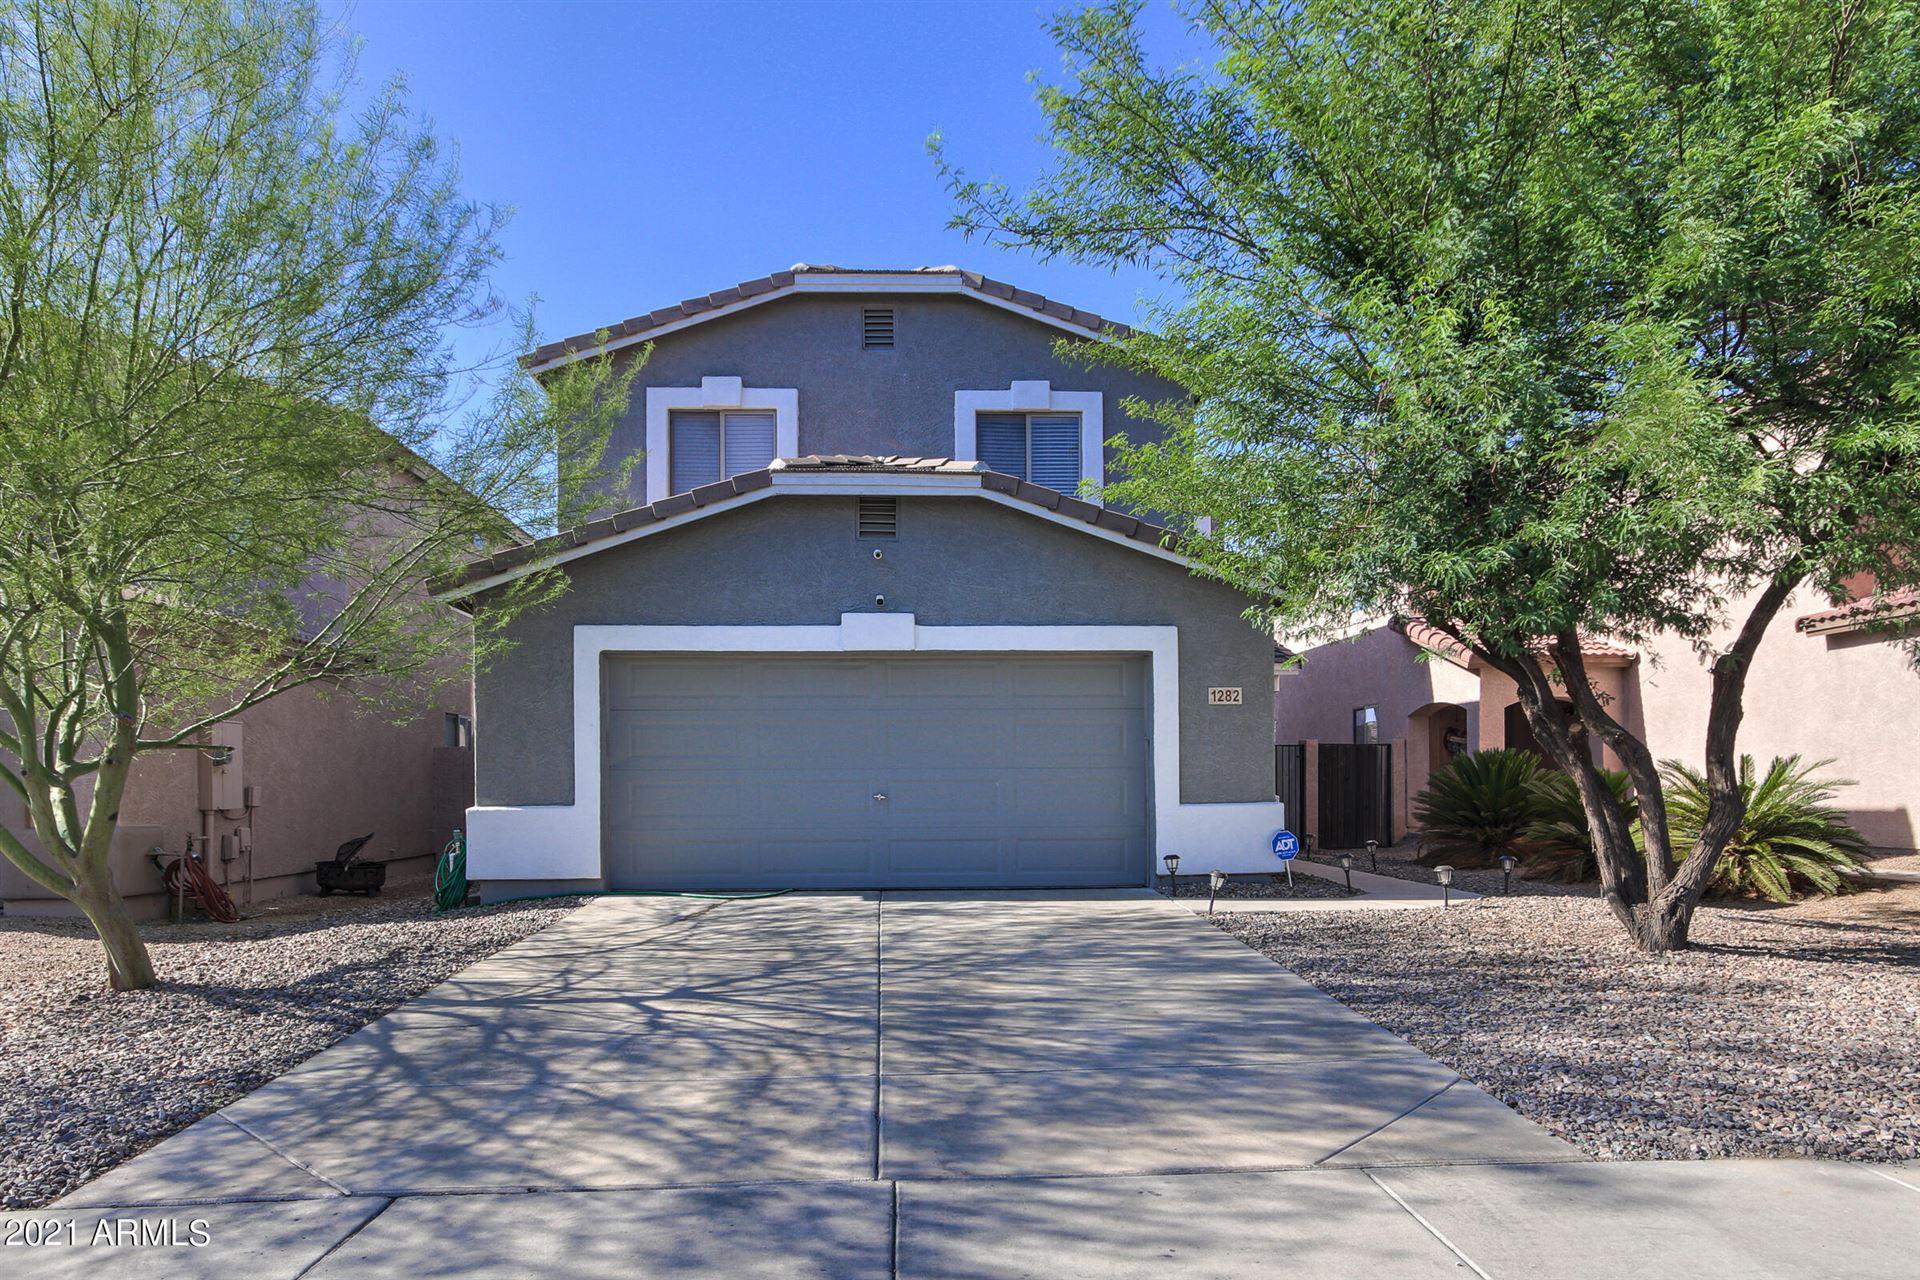 1282 E LEAF Road, San Tan Valley, AZ 85140 - MLS#: 6246689